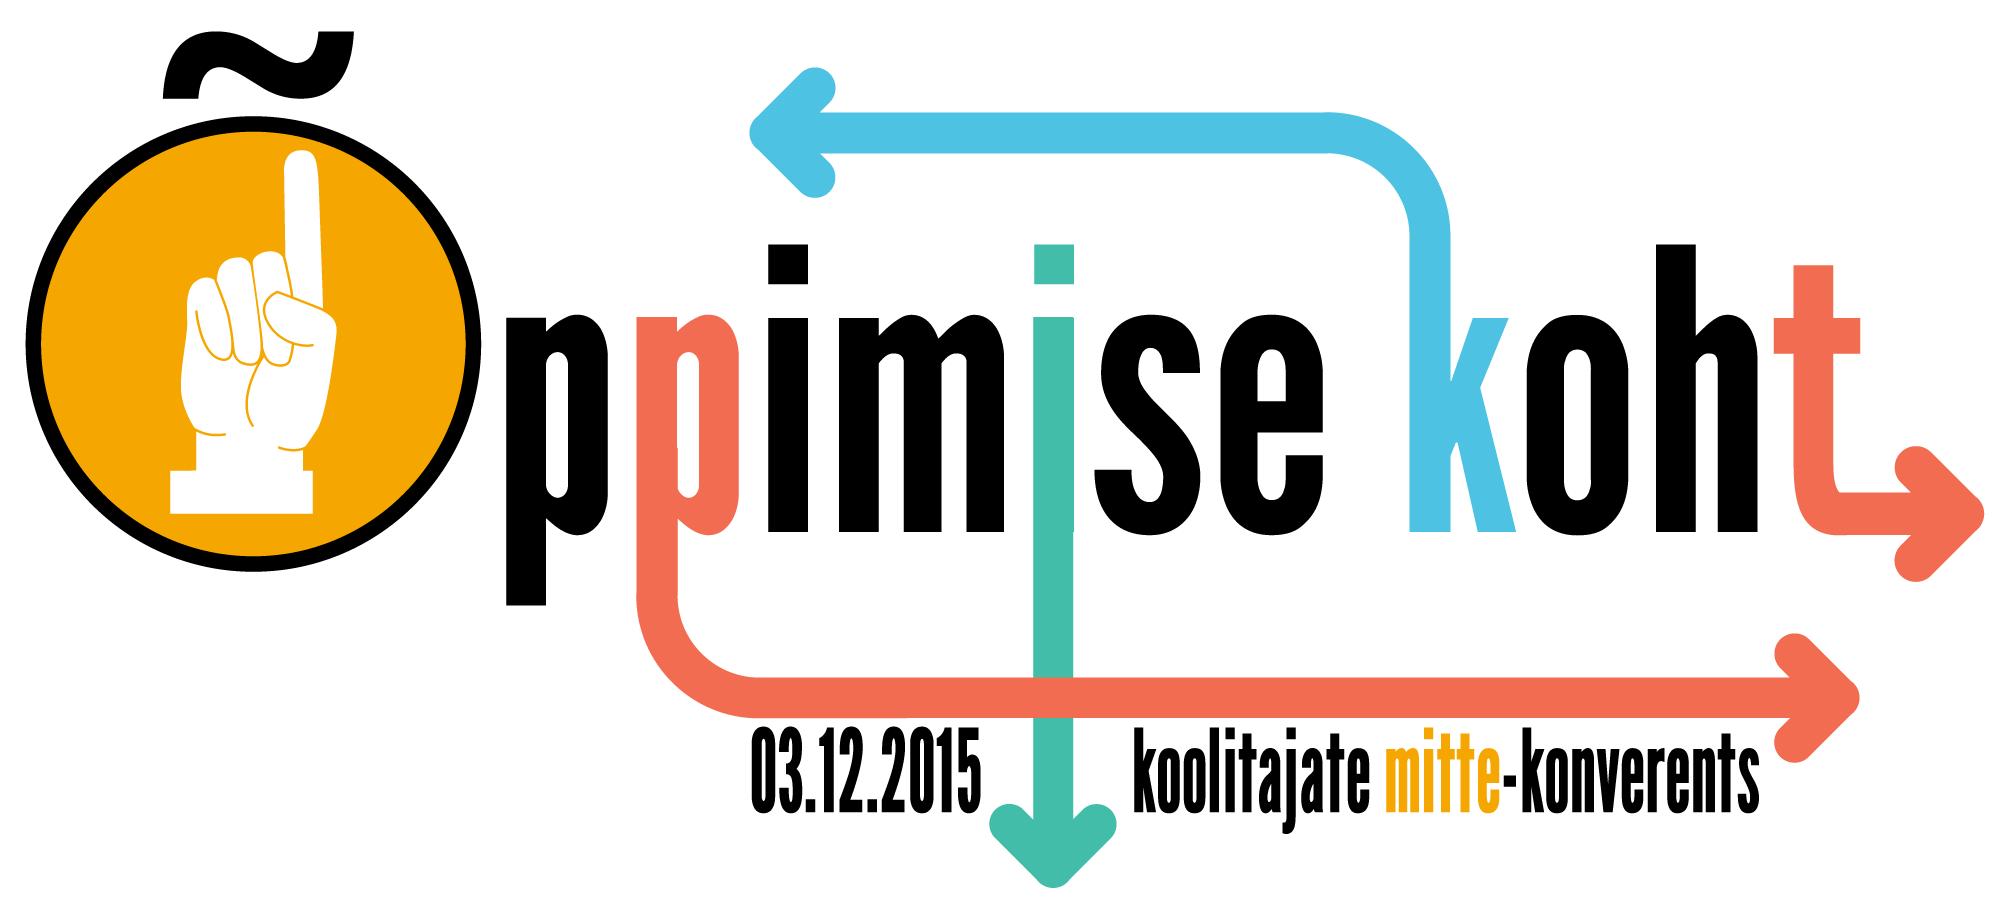 mitte-konverents 2015